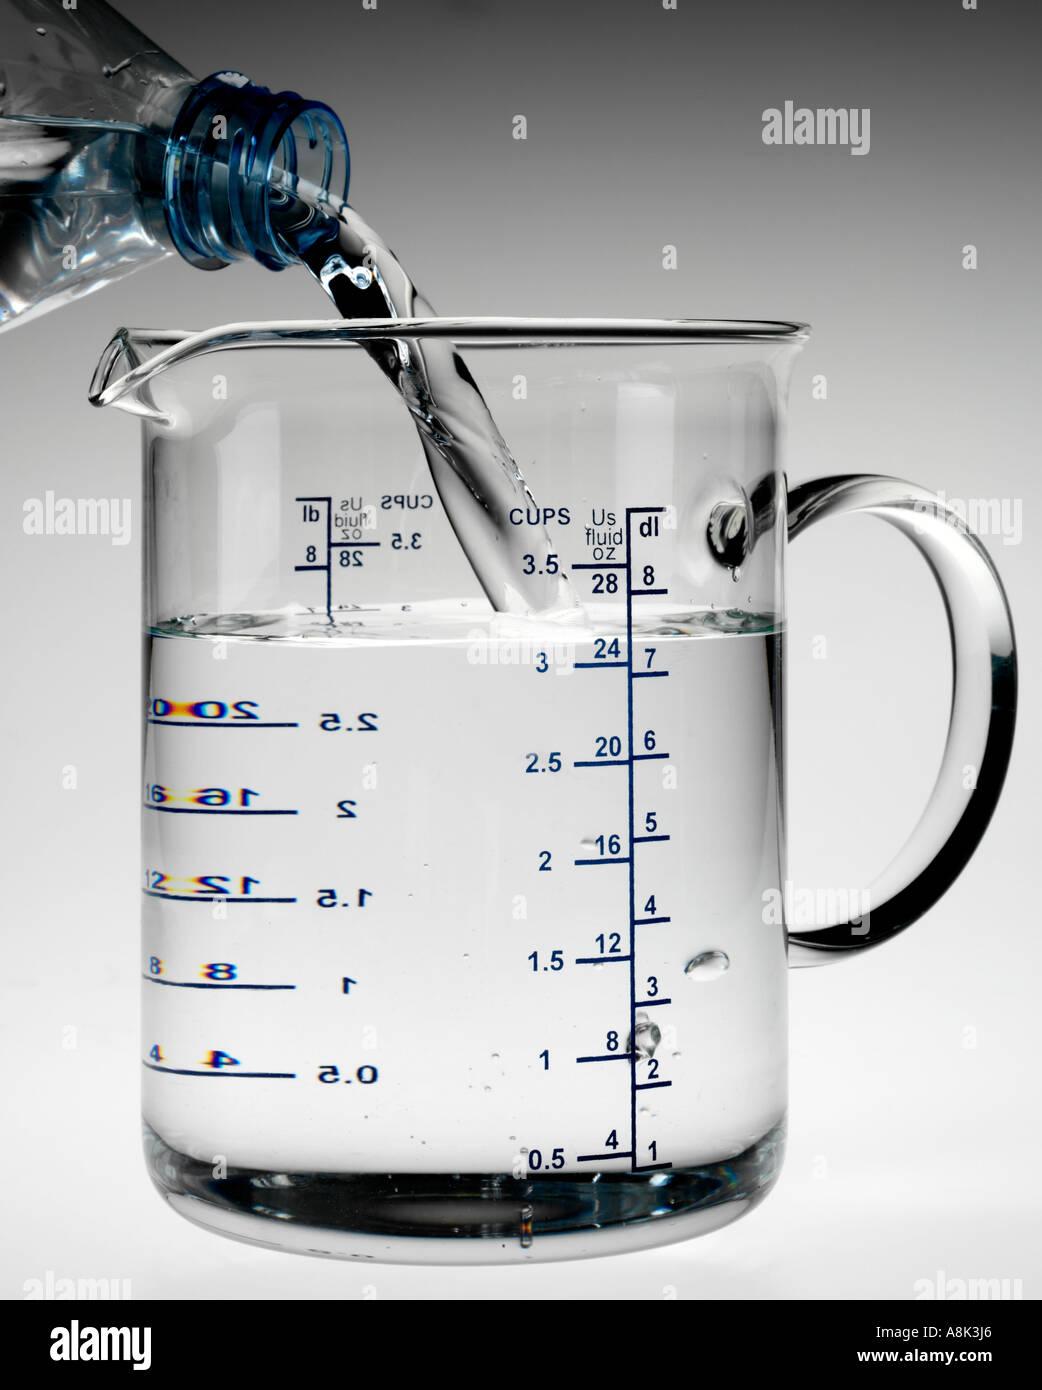 Pouring Into Measuring Jug Stock Photo 6926693 Alamy